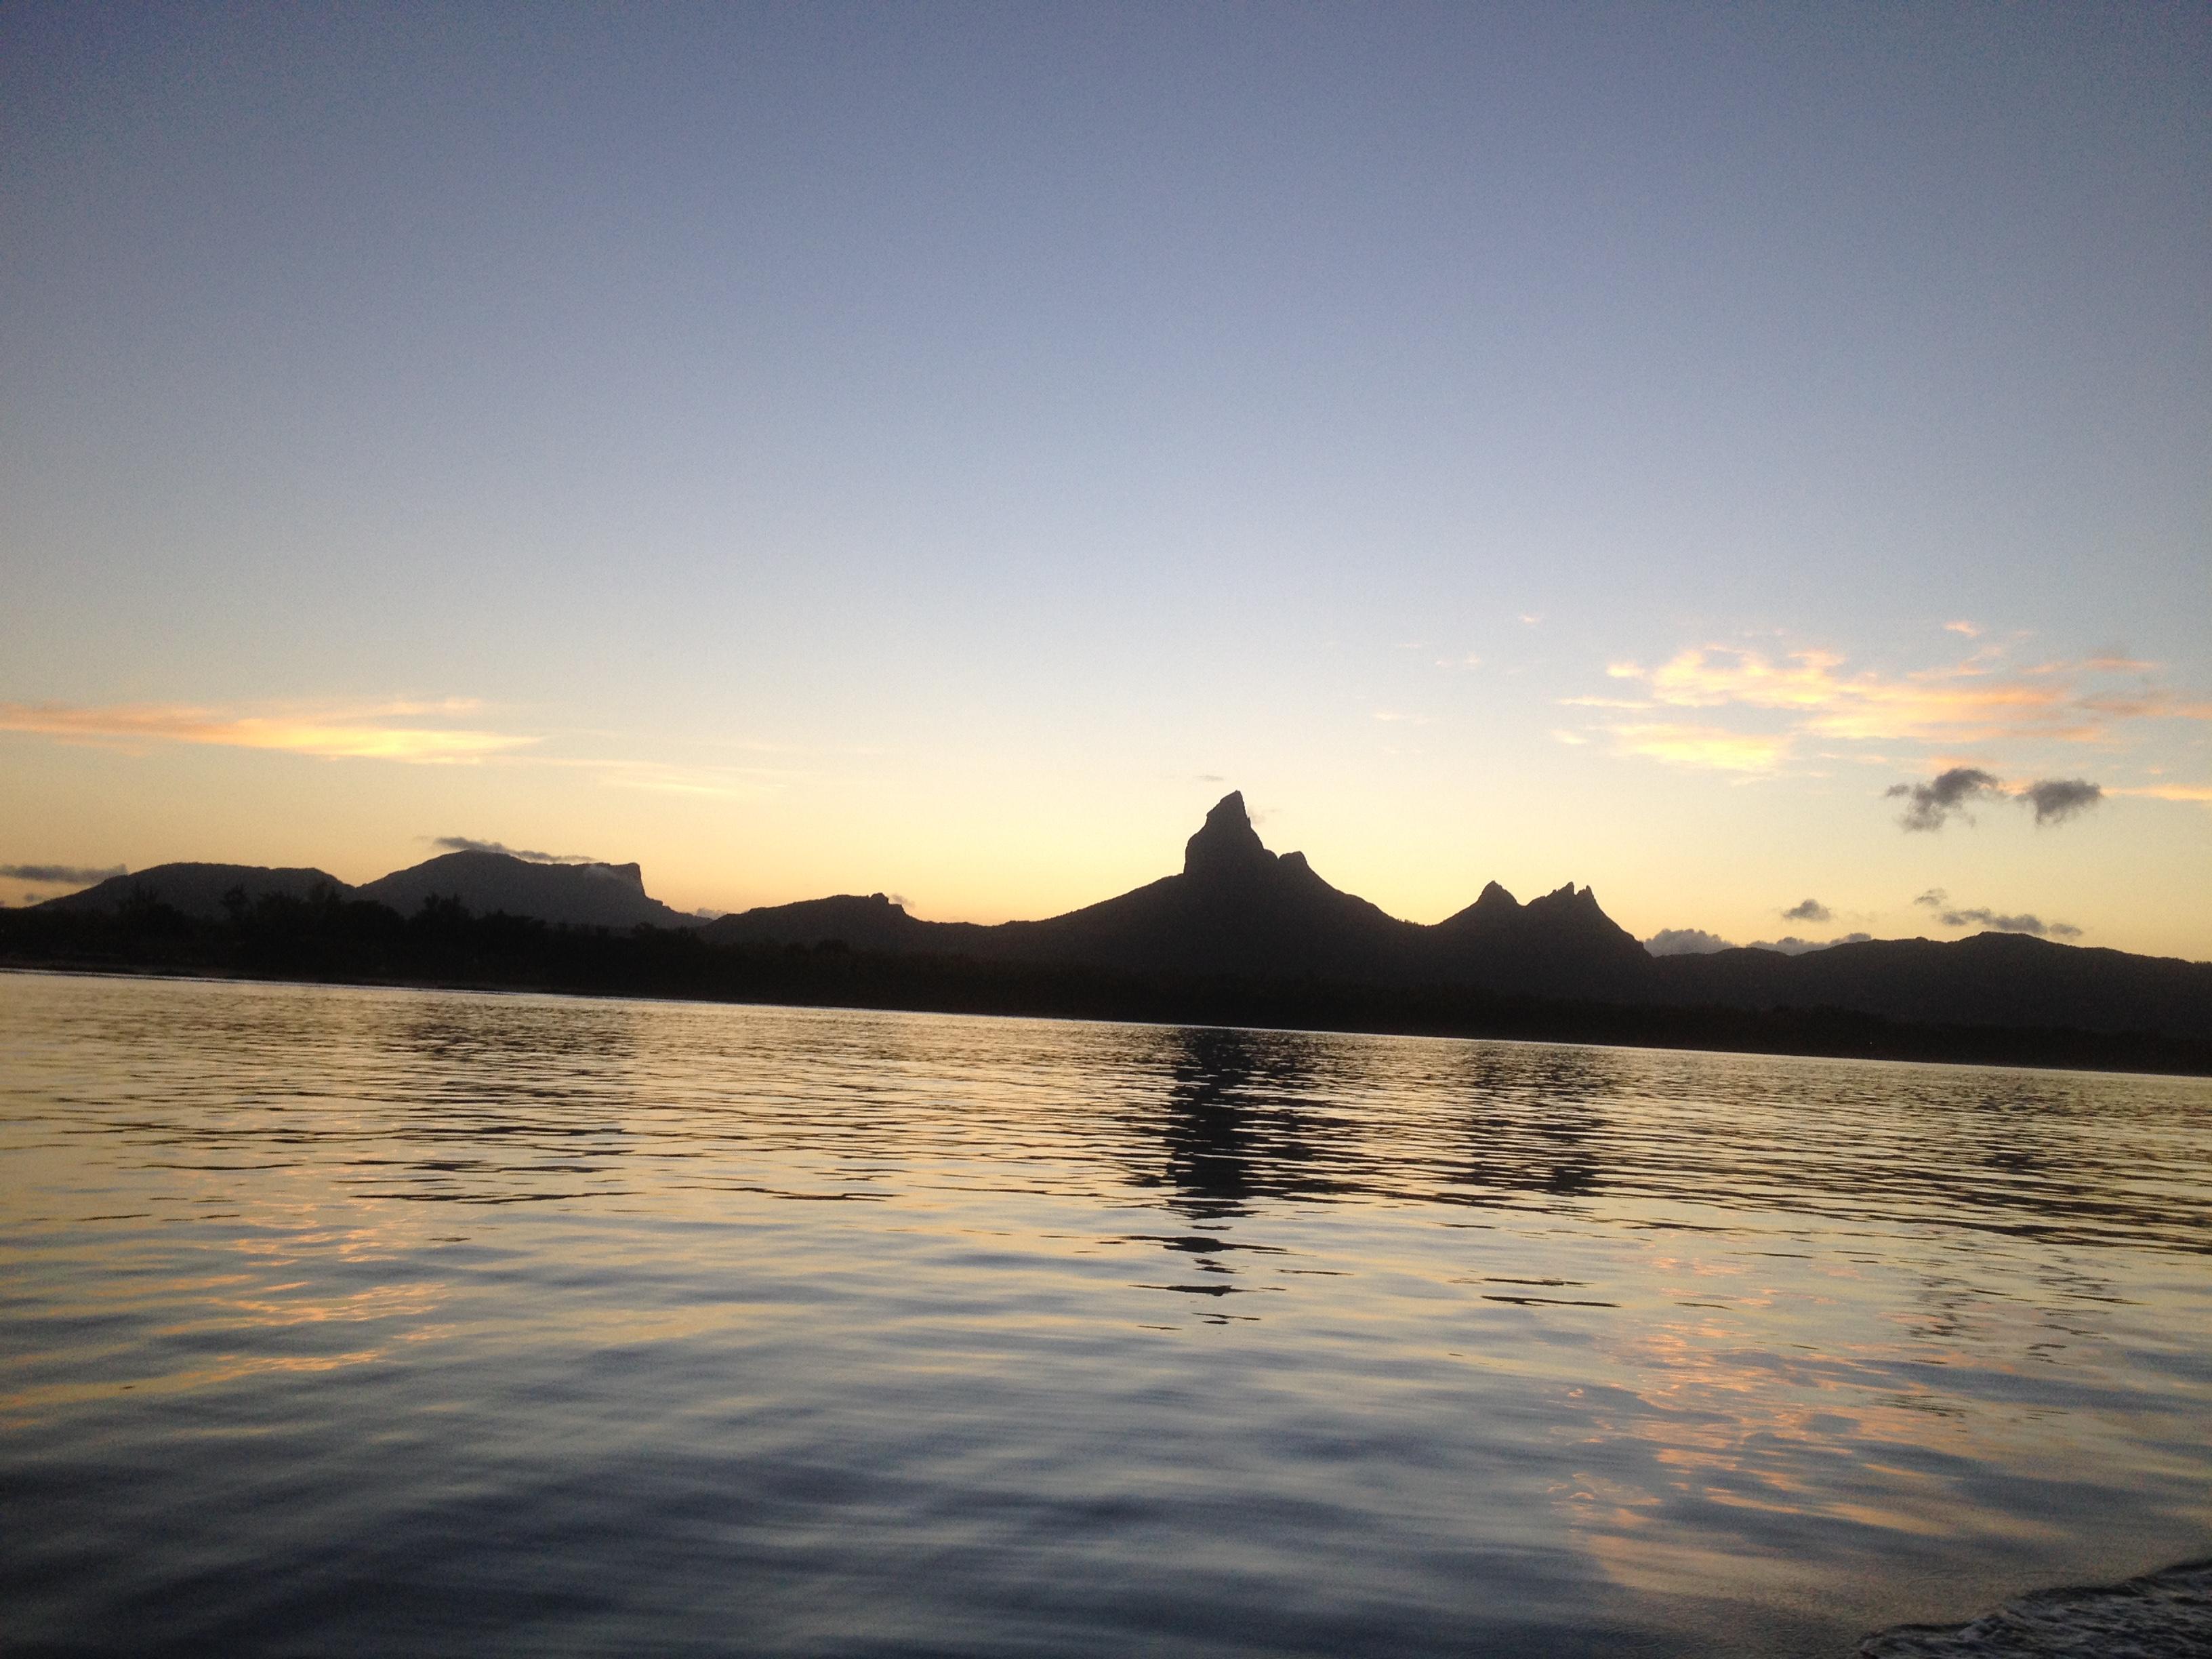 ile-maurice-excursions-bateau-prive-caro-des-iles-tamarin-nager-avec-les-dauphins-ile-maurice-apnee-prive-gopro-voyage-vacances-3